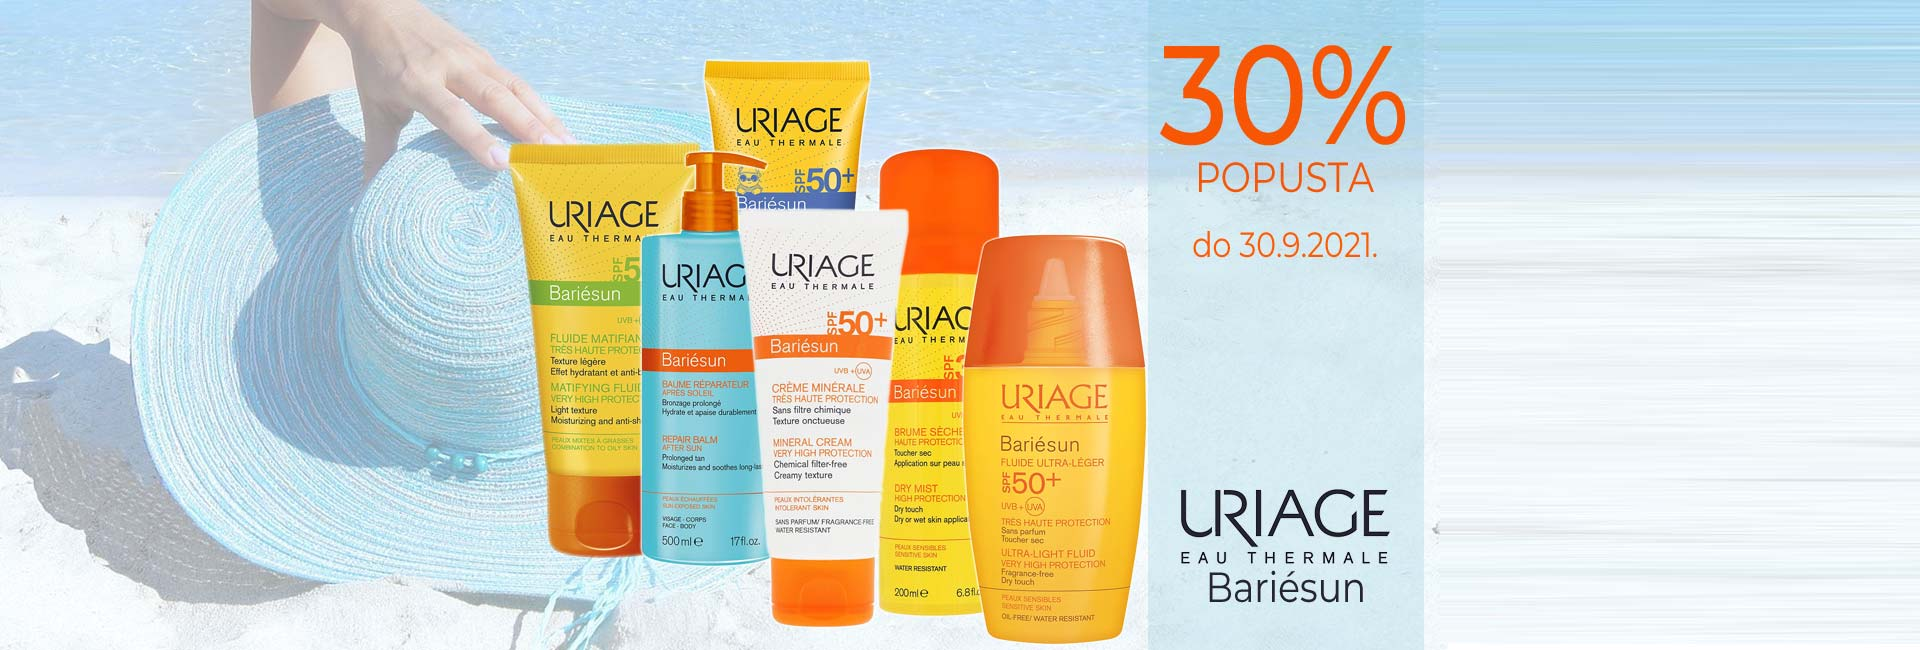 uriage sun -30% do 30.9.2021